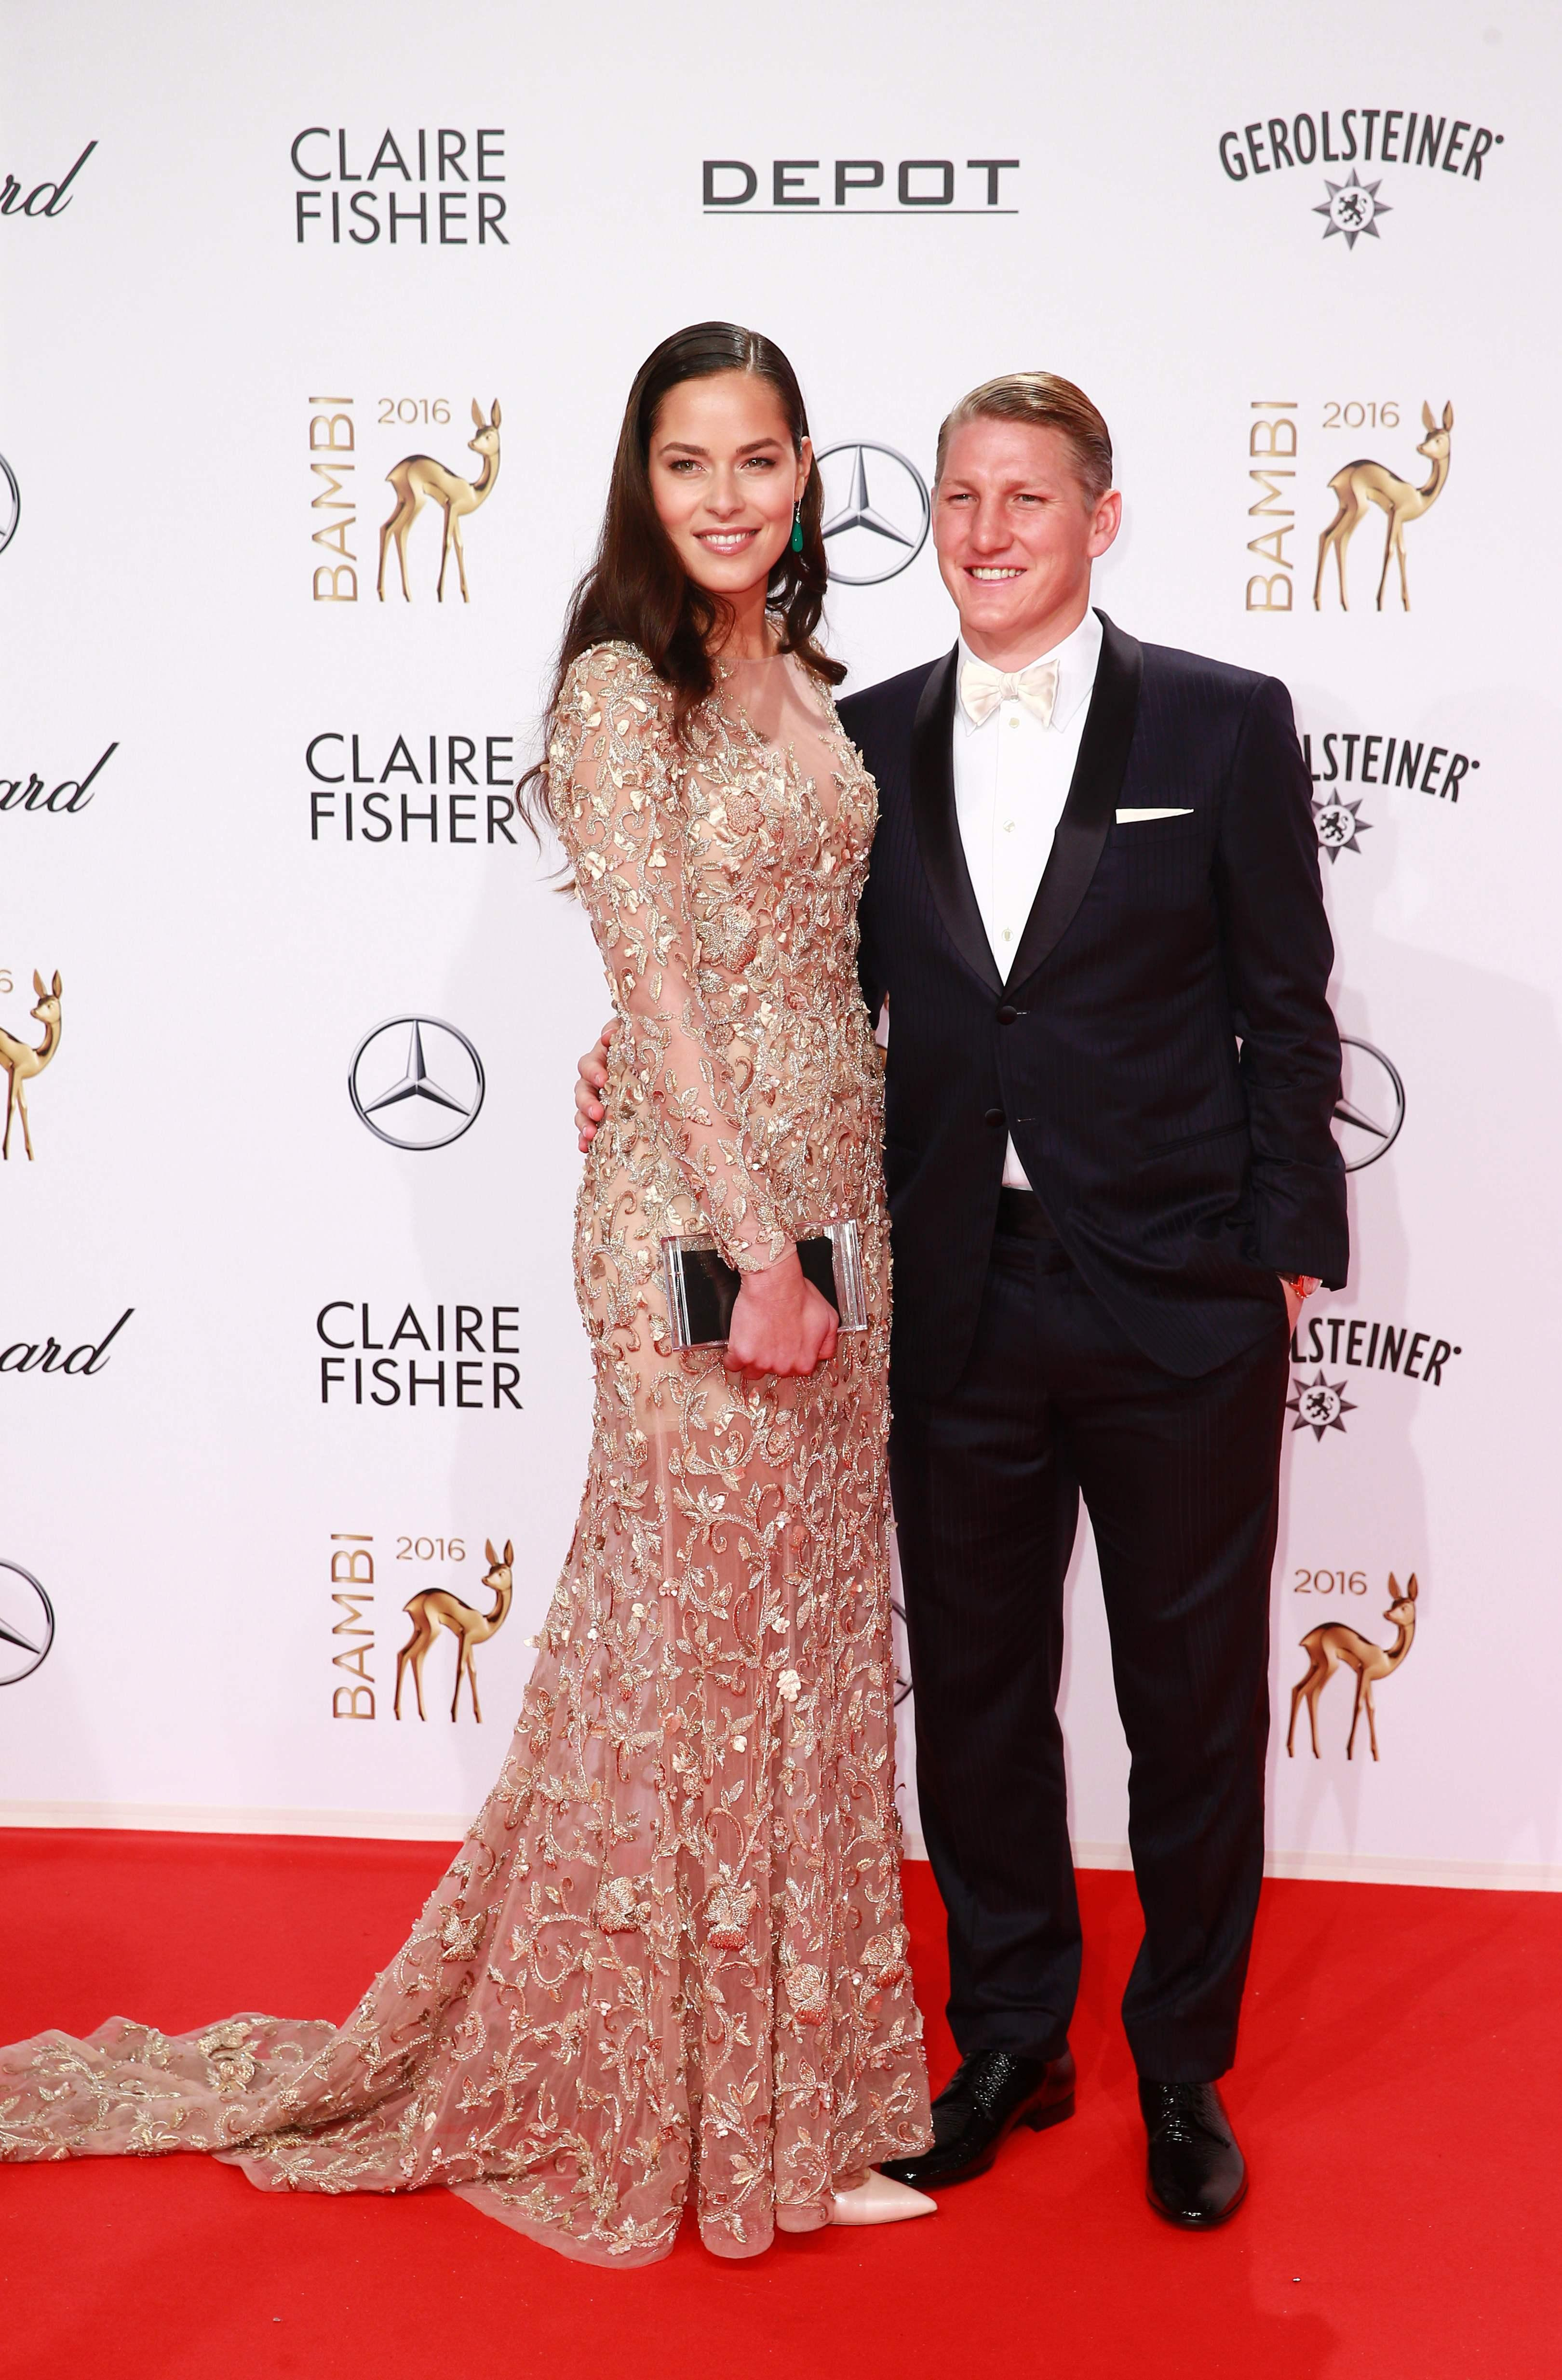 Ivanovic looks stunning in a gold dress next to husband Schweinsteiger